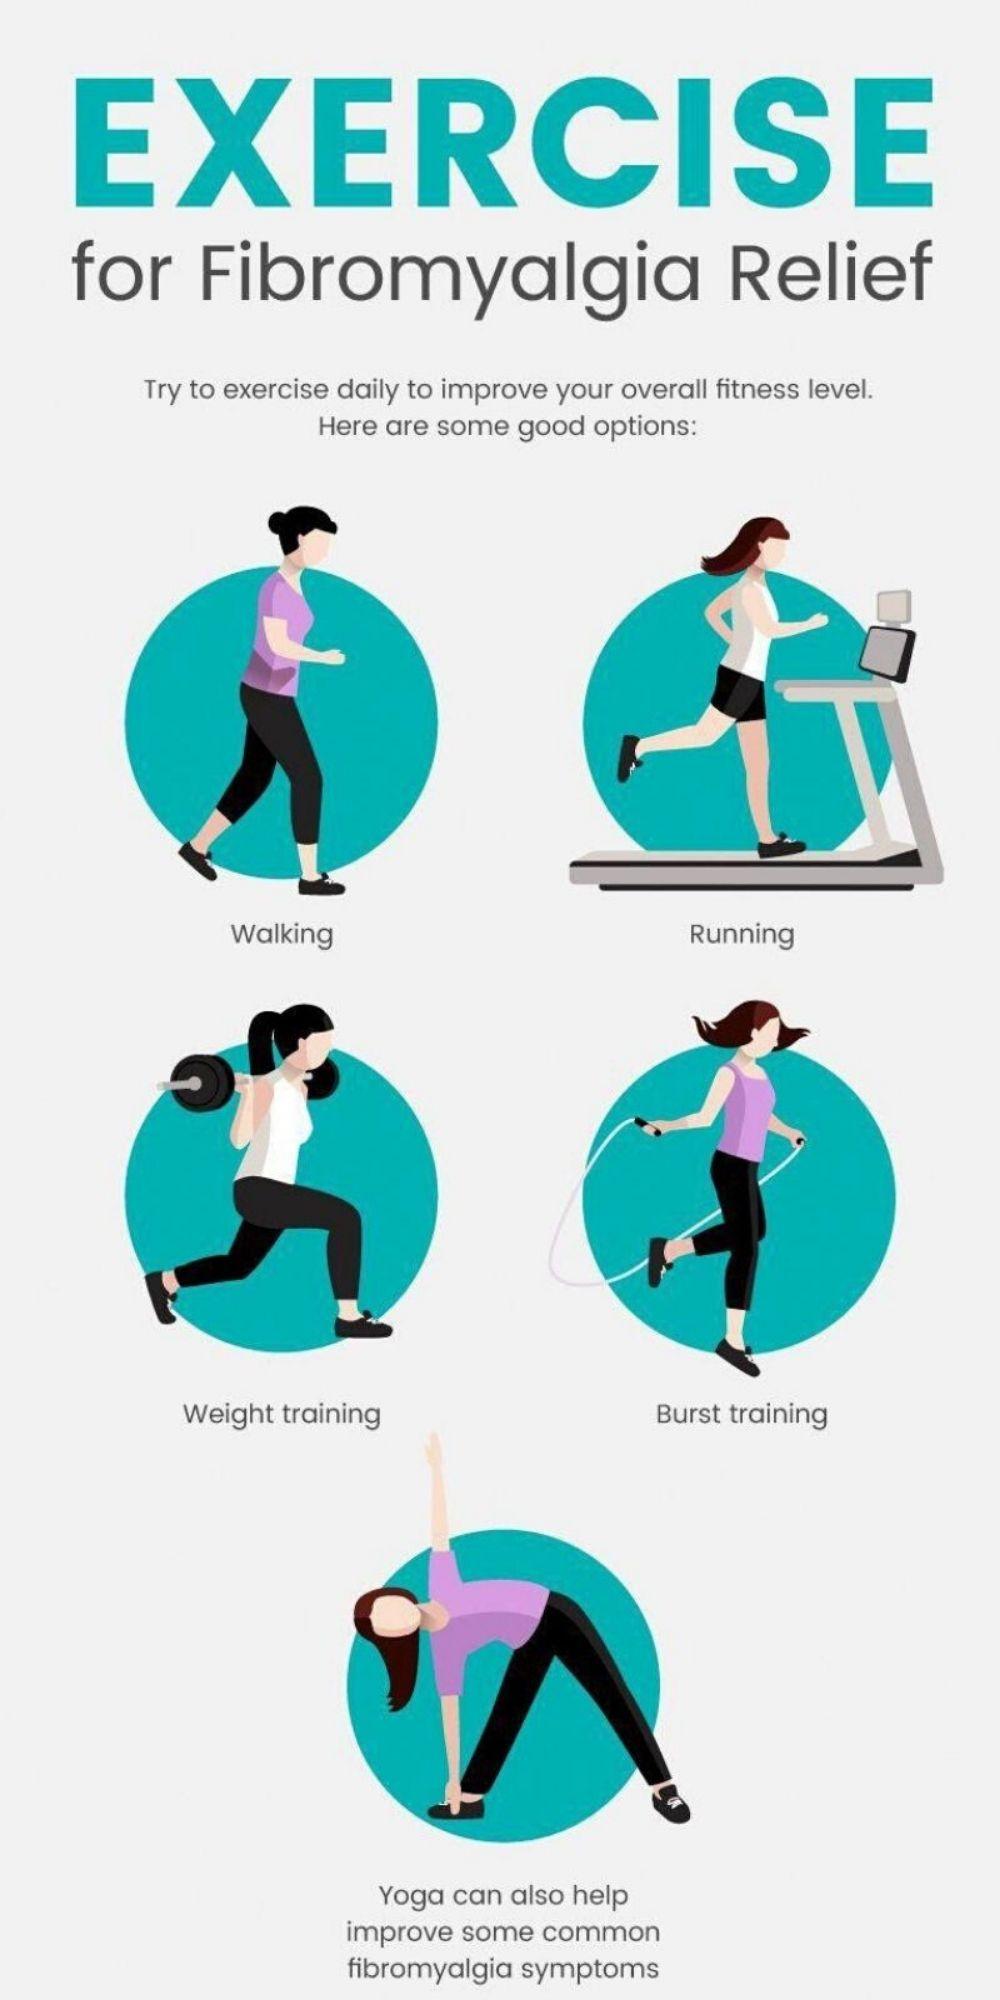 Exercises Help in Treating Fibromyalgia